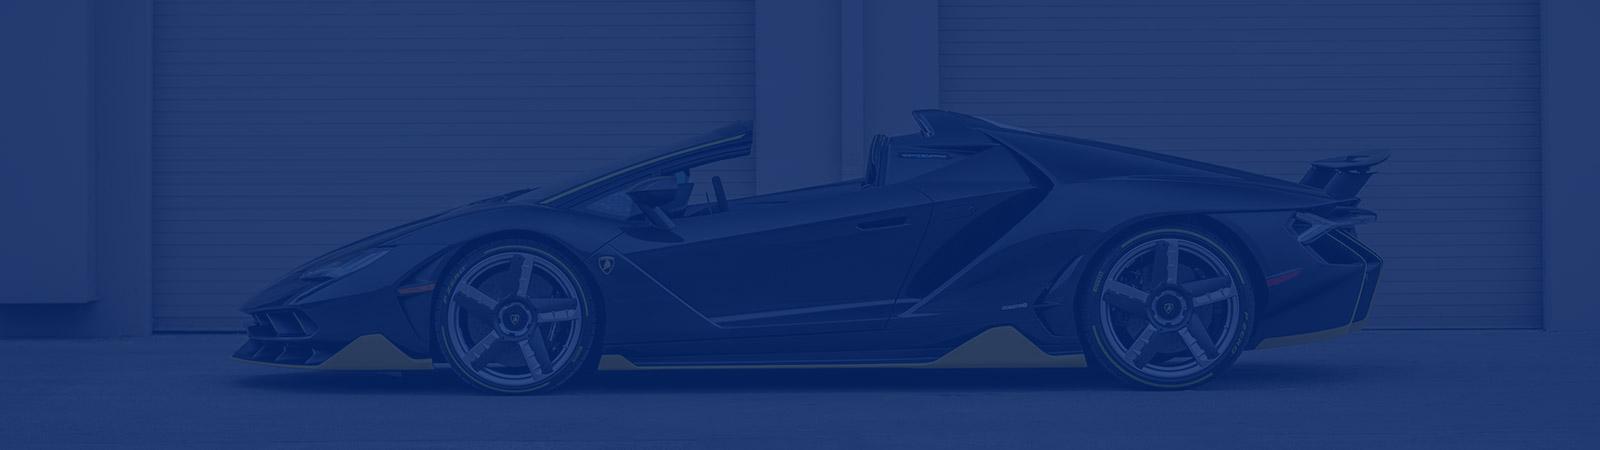 Lamborghini Centenario Roadster 1 of 20 XPEL SEMA